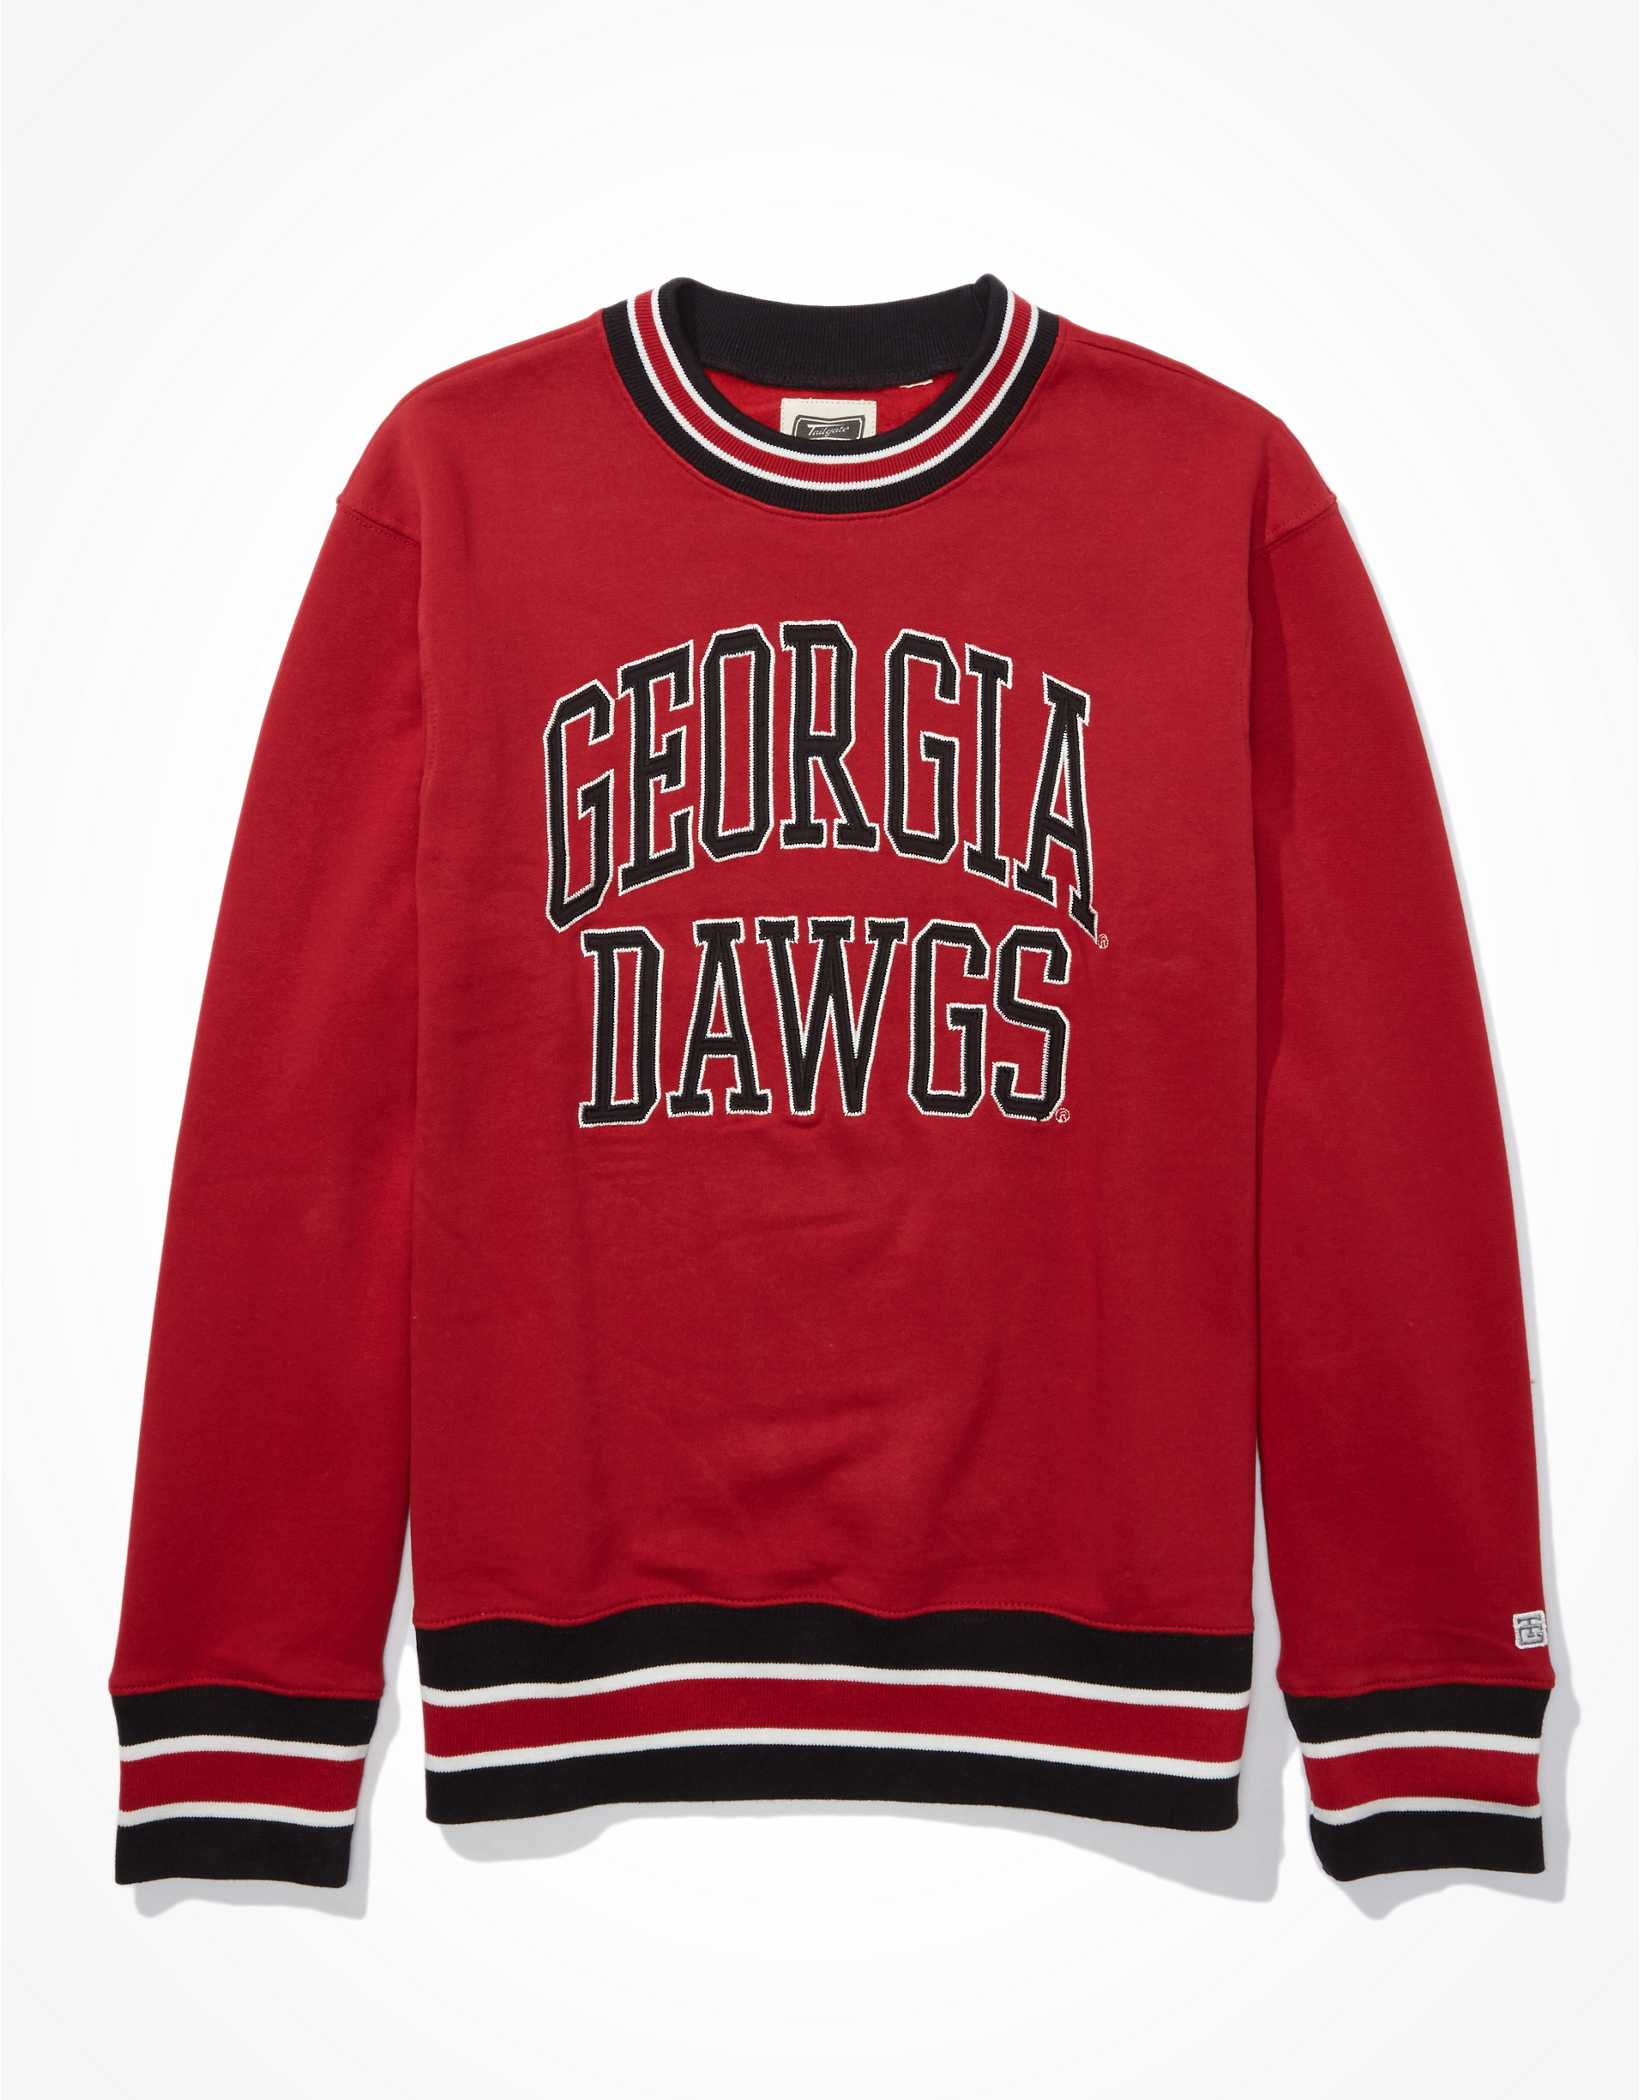 Tailgate Men's Georgia Bulldogs Tipped Fleece Sweatshirt